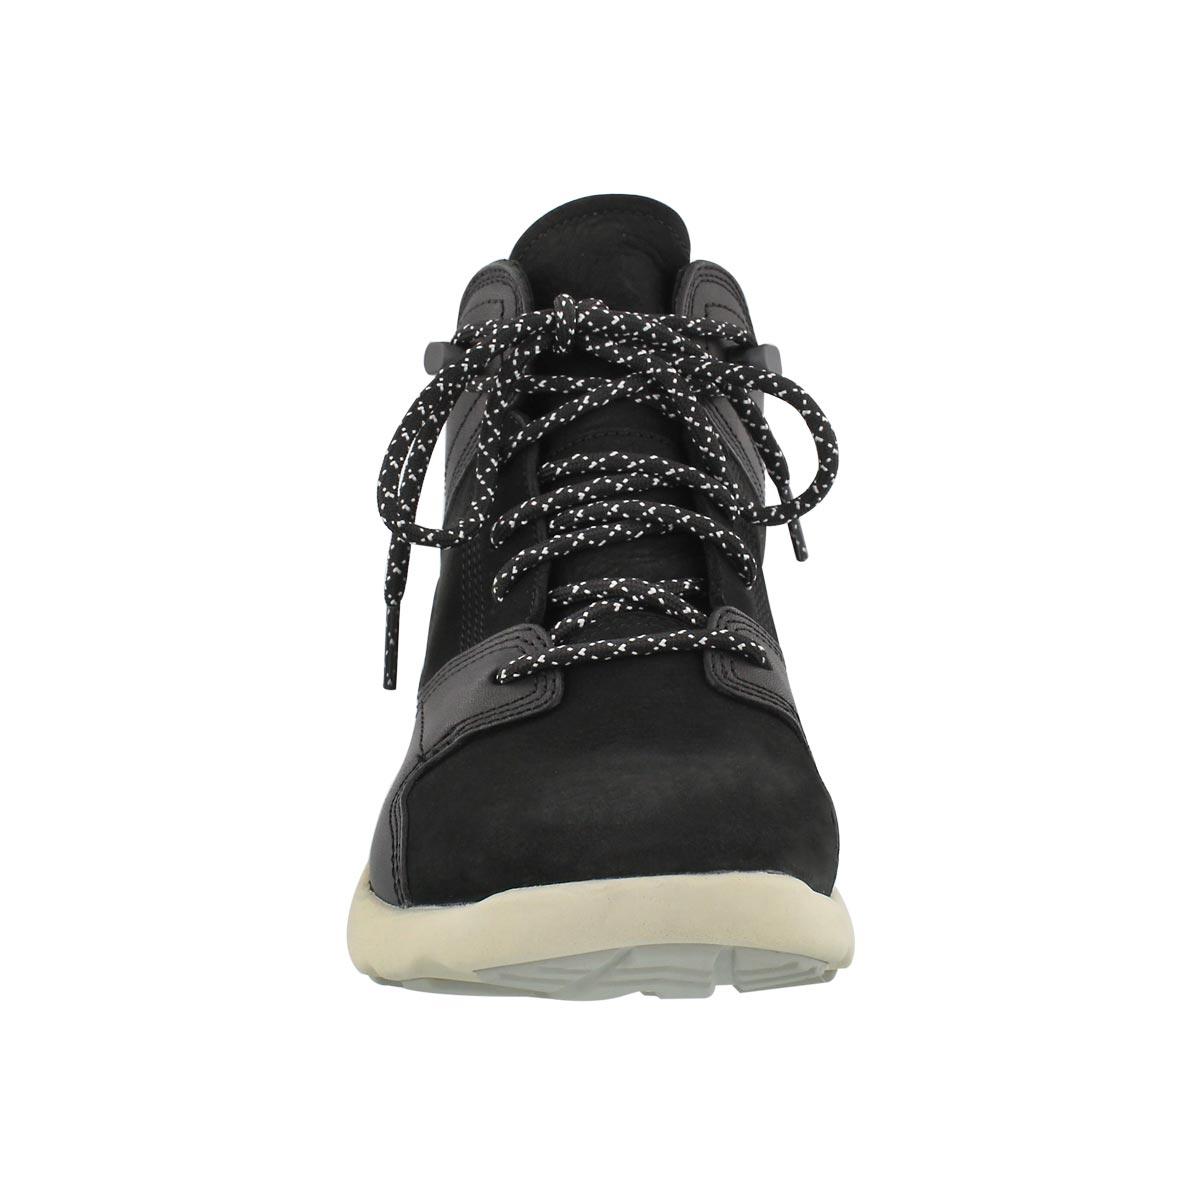 Lds Fly Roam black hiking boot